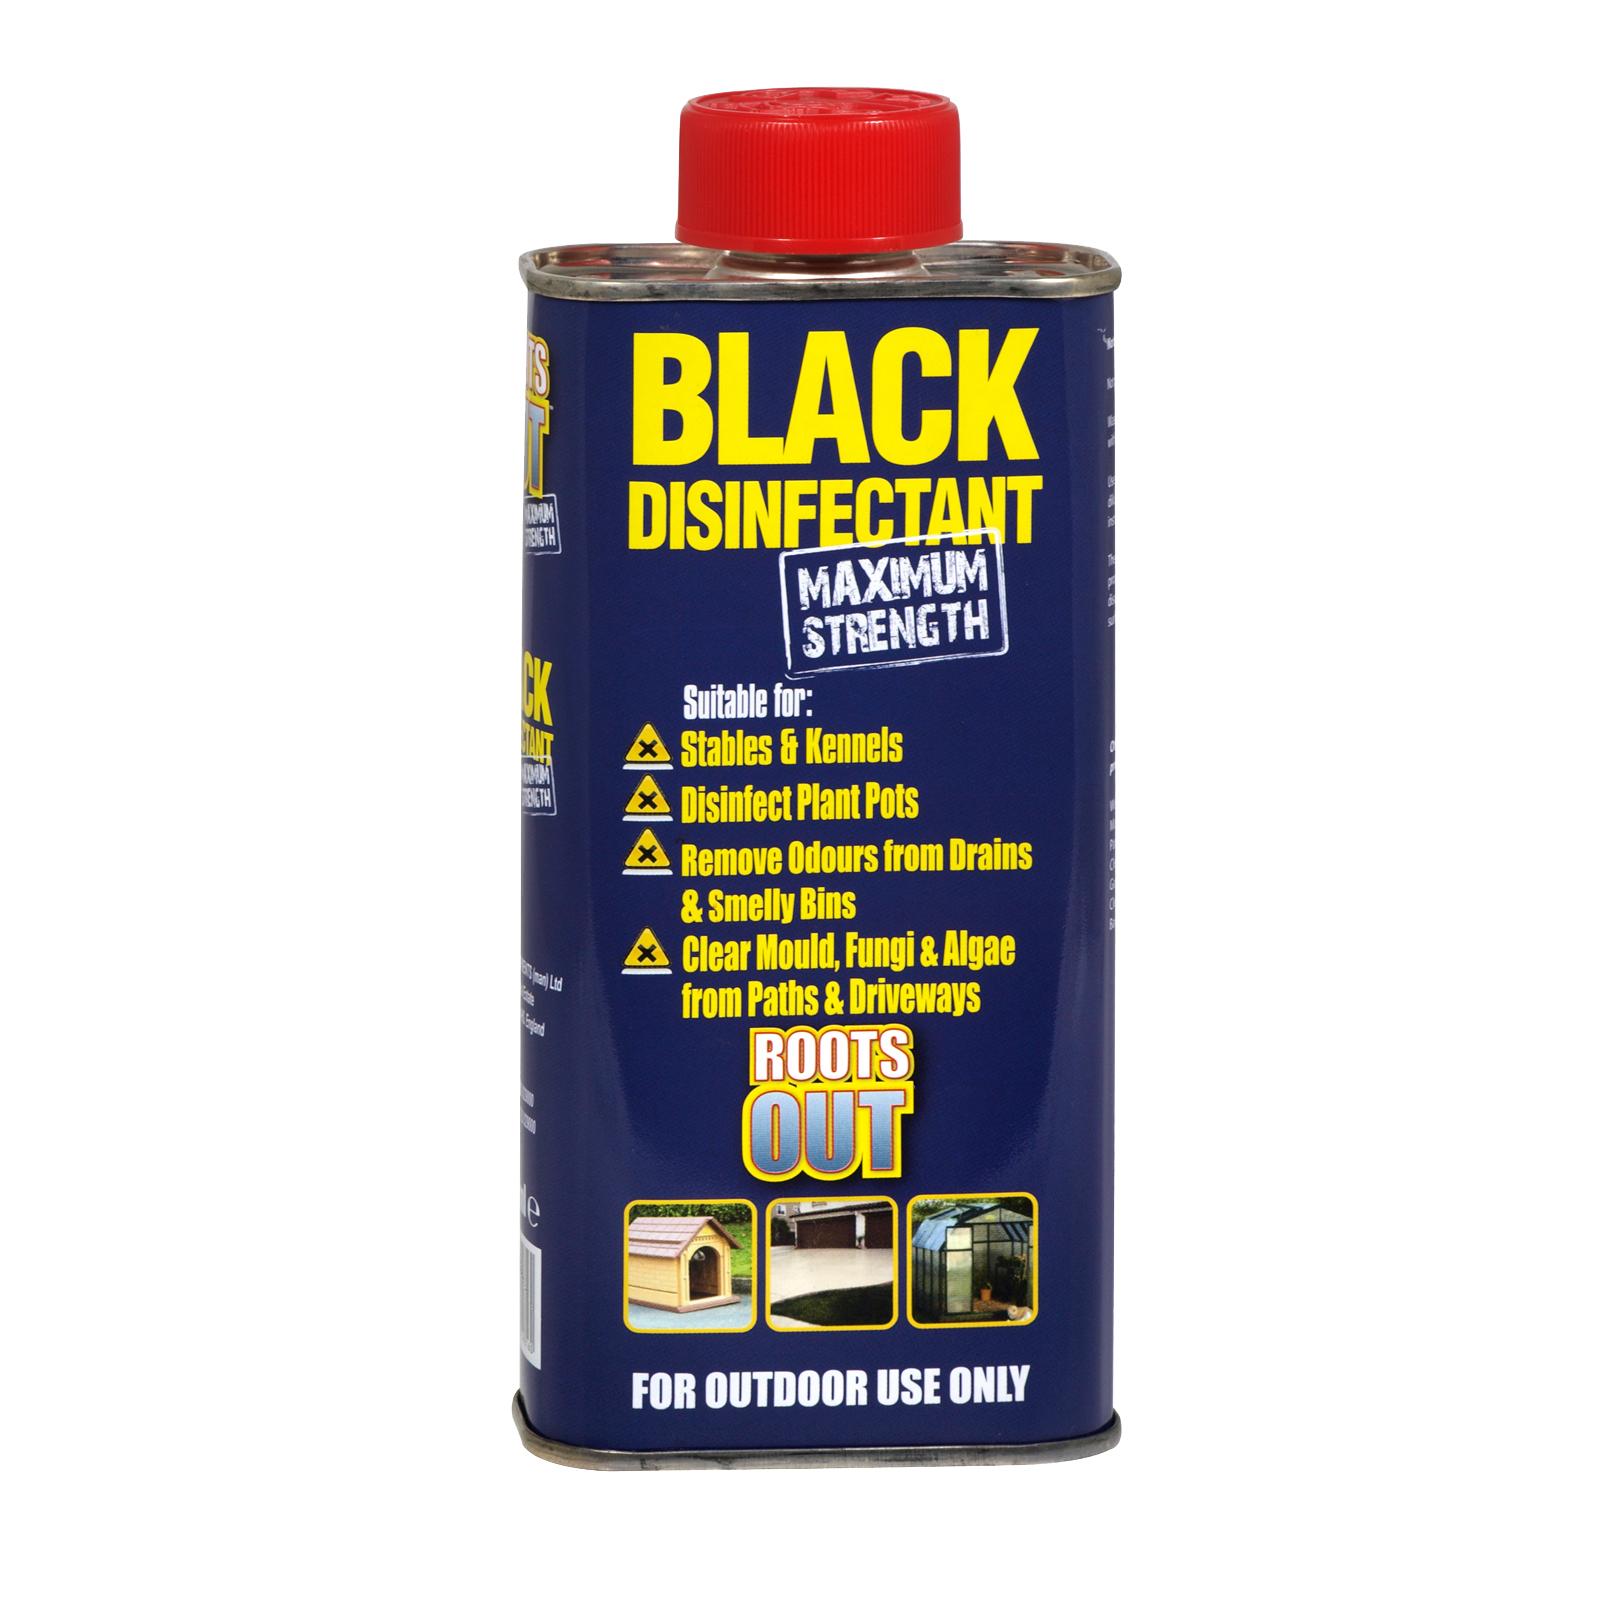 BLACK DISINFECTANT MAX STRENGTH 300M